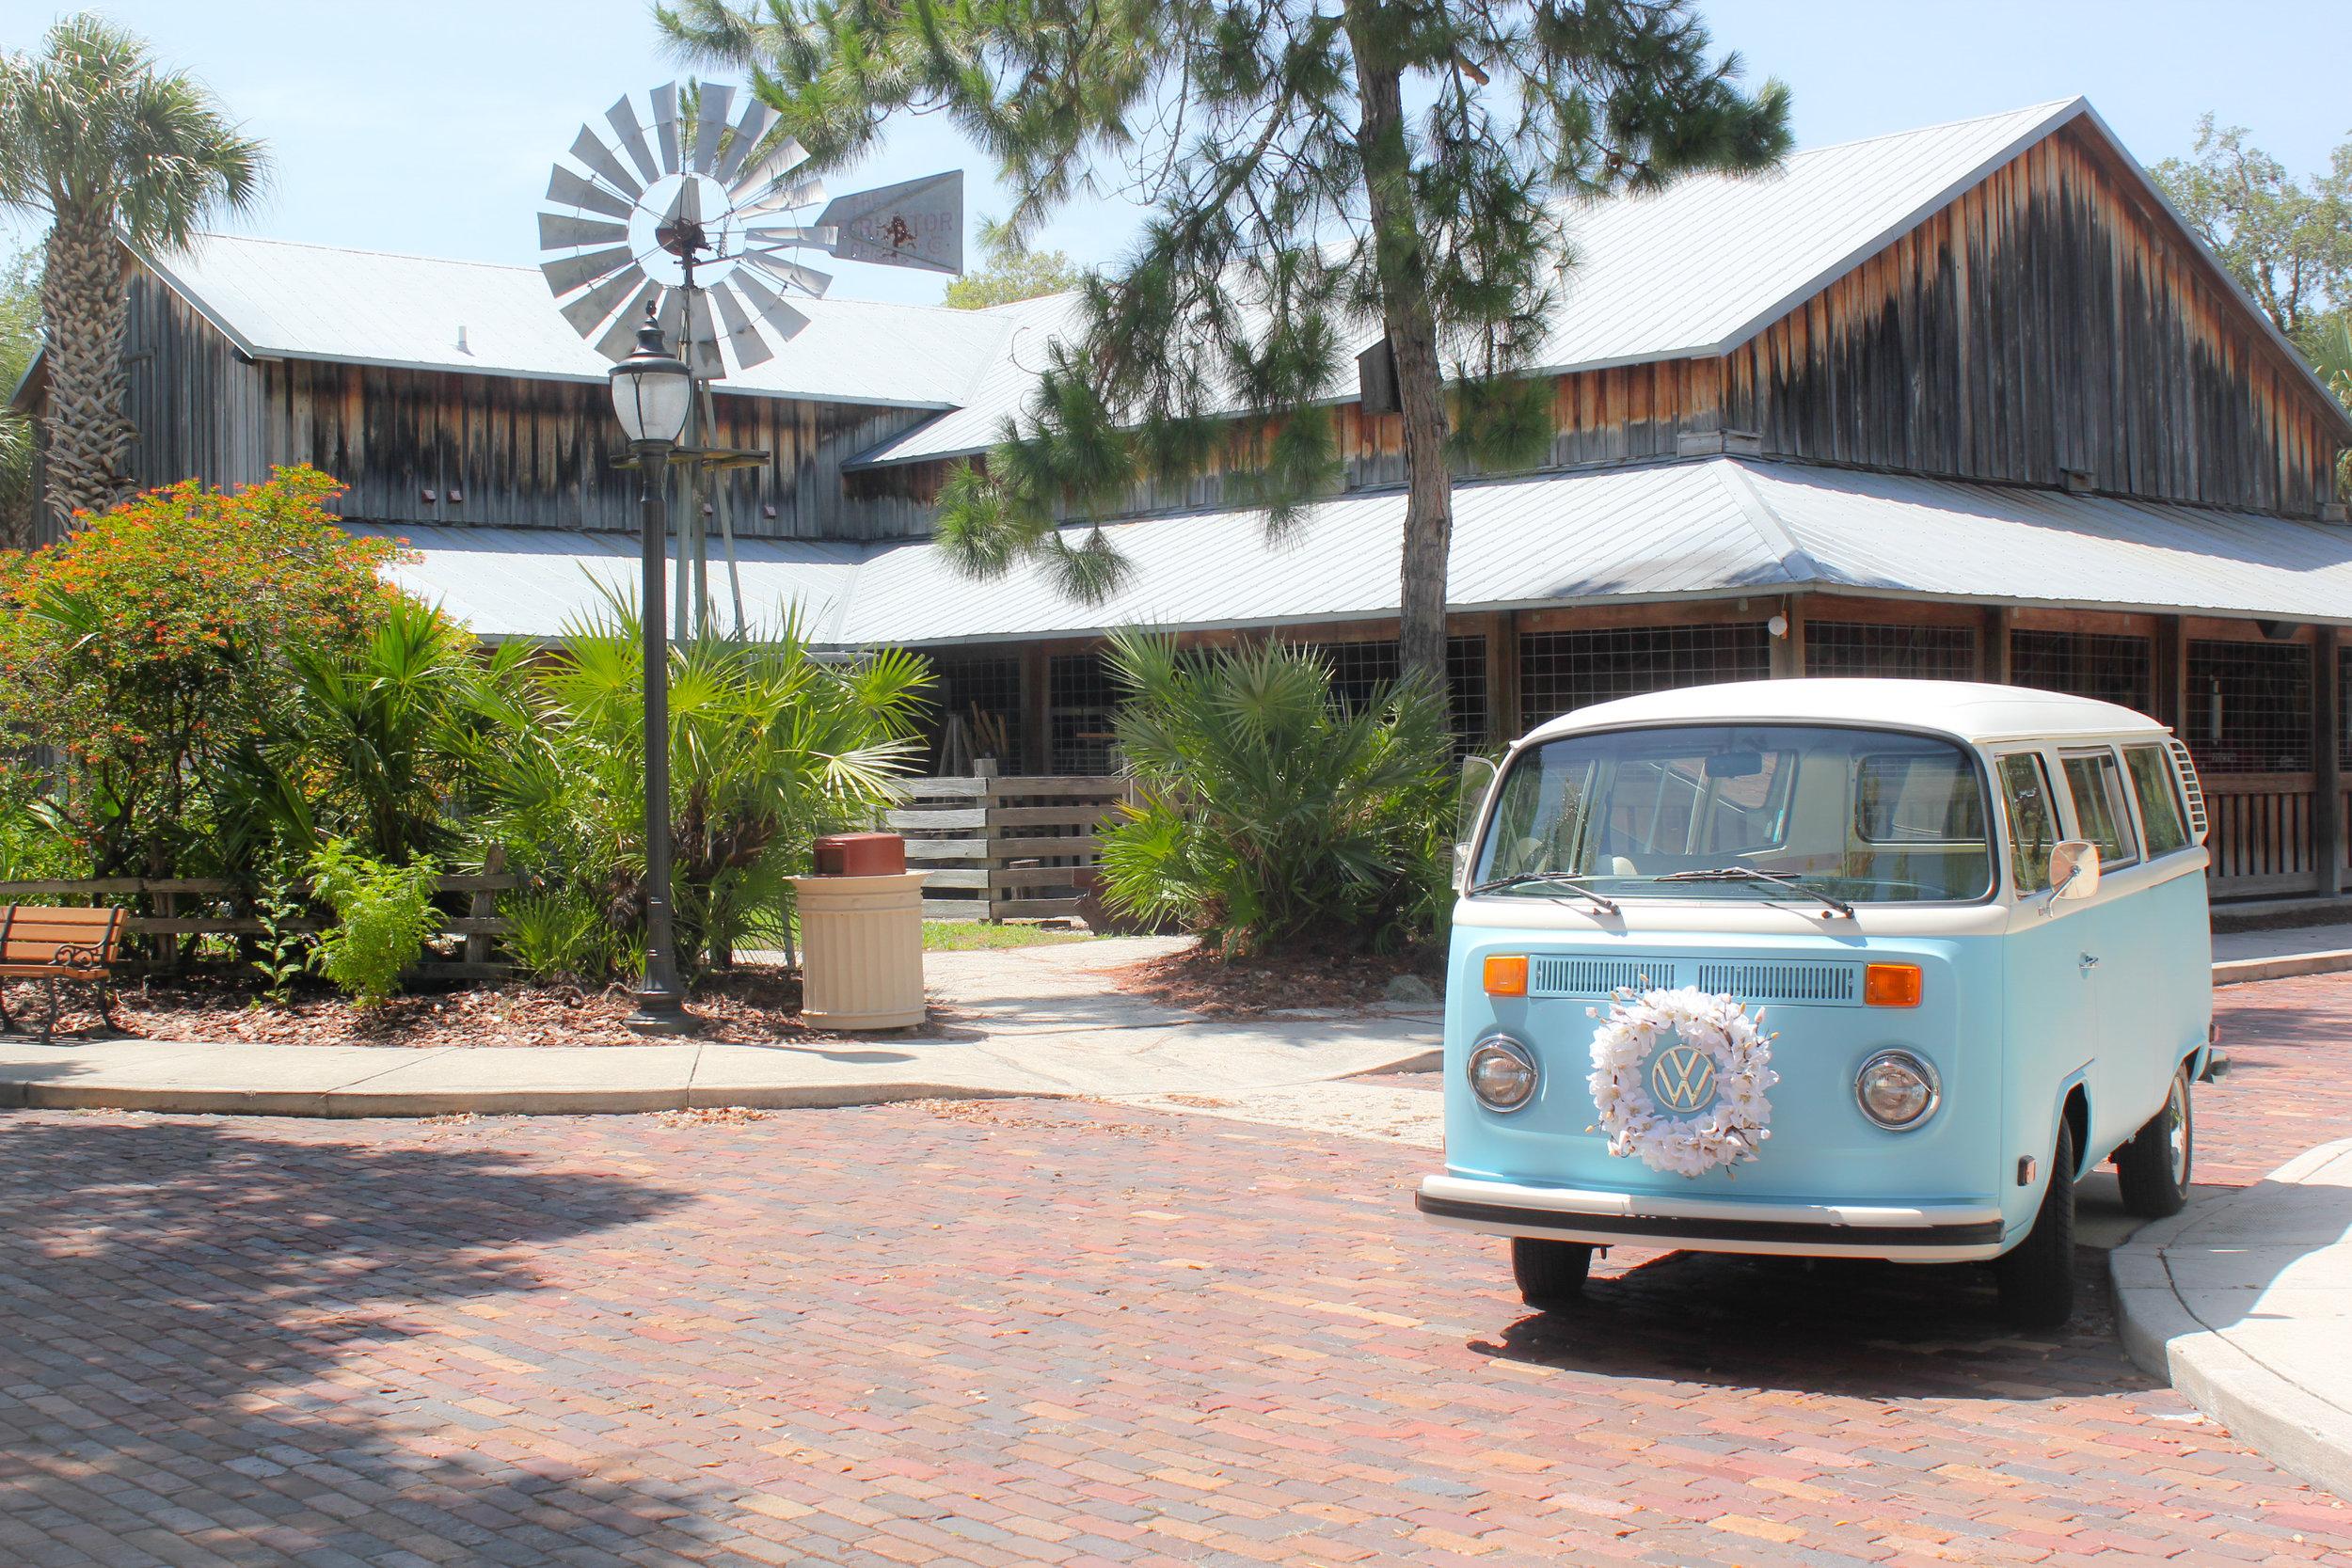 VW Bus photo booth in East Bradenton FL.